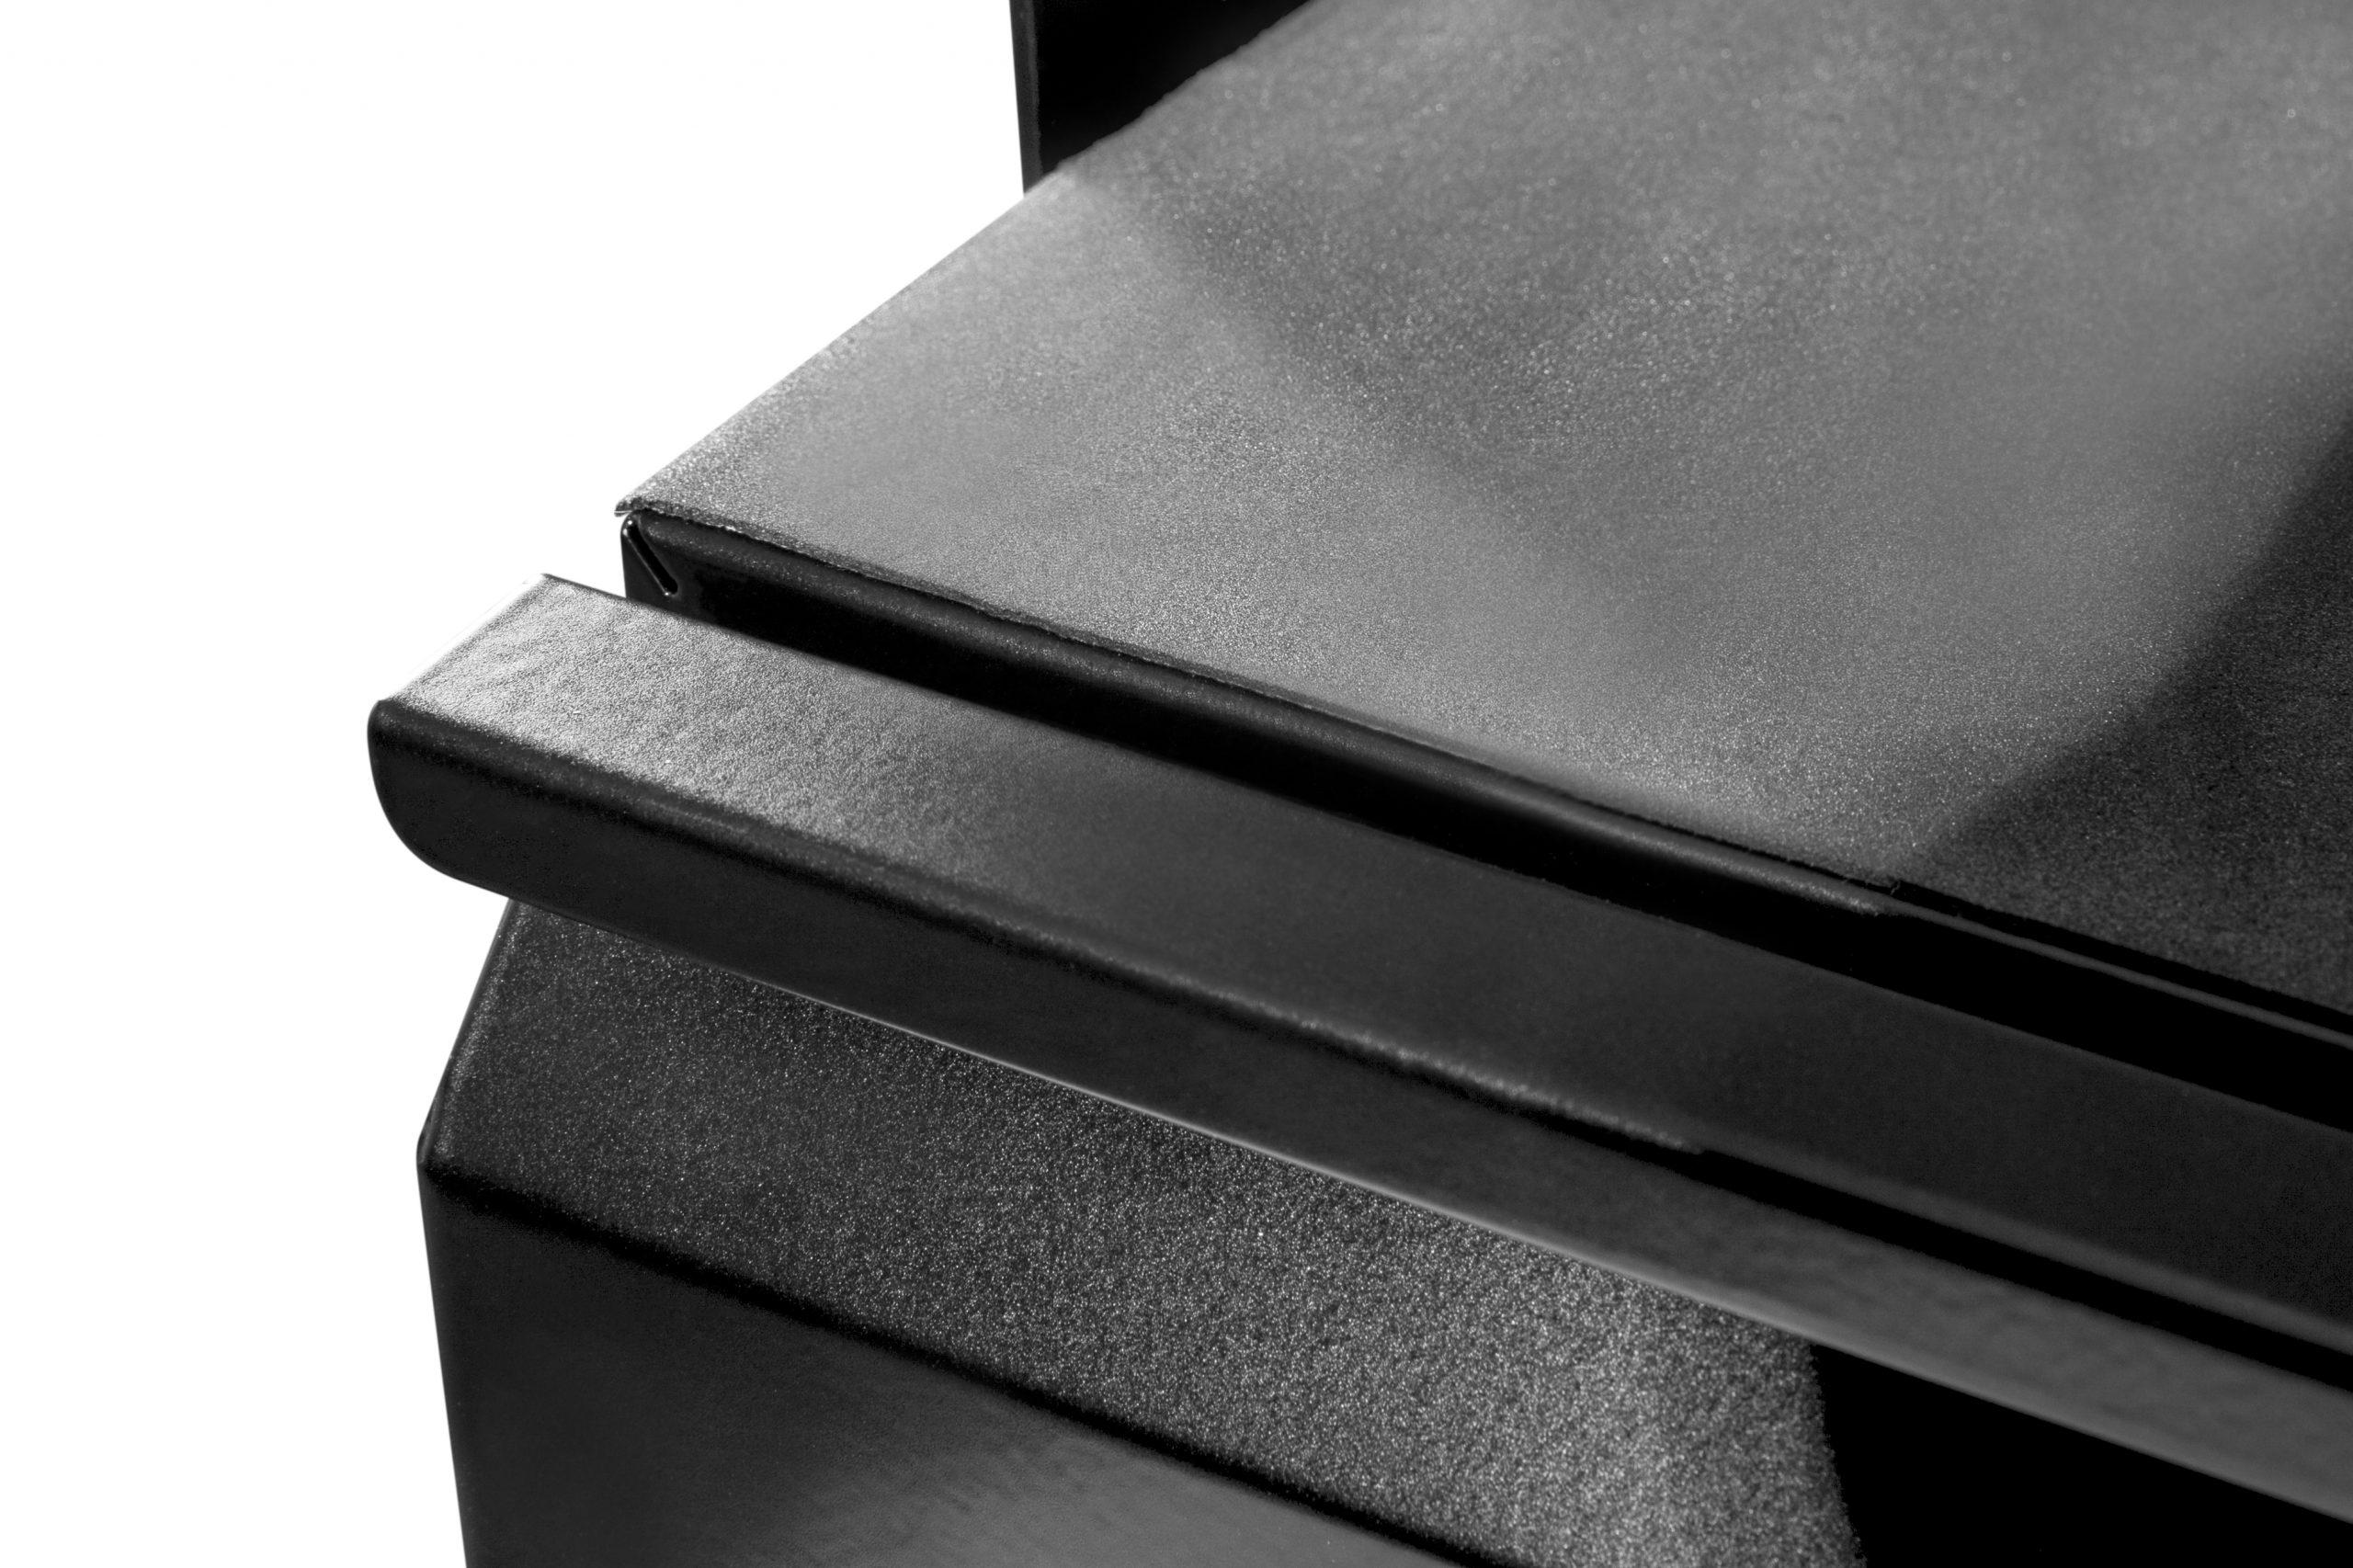 Allcam US022 Under-desk storage drawer & laptop shelf padded eva layer